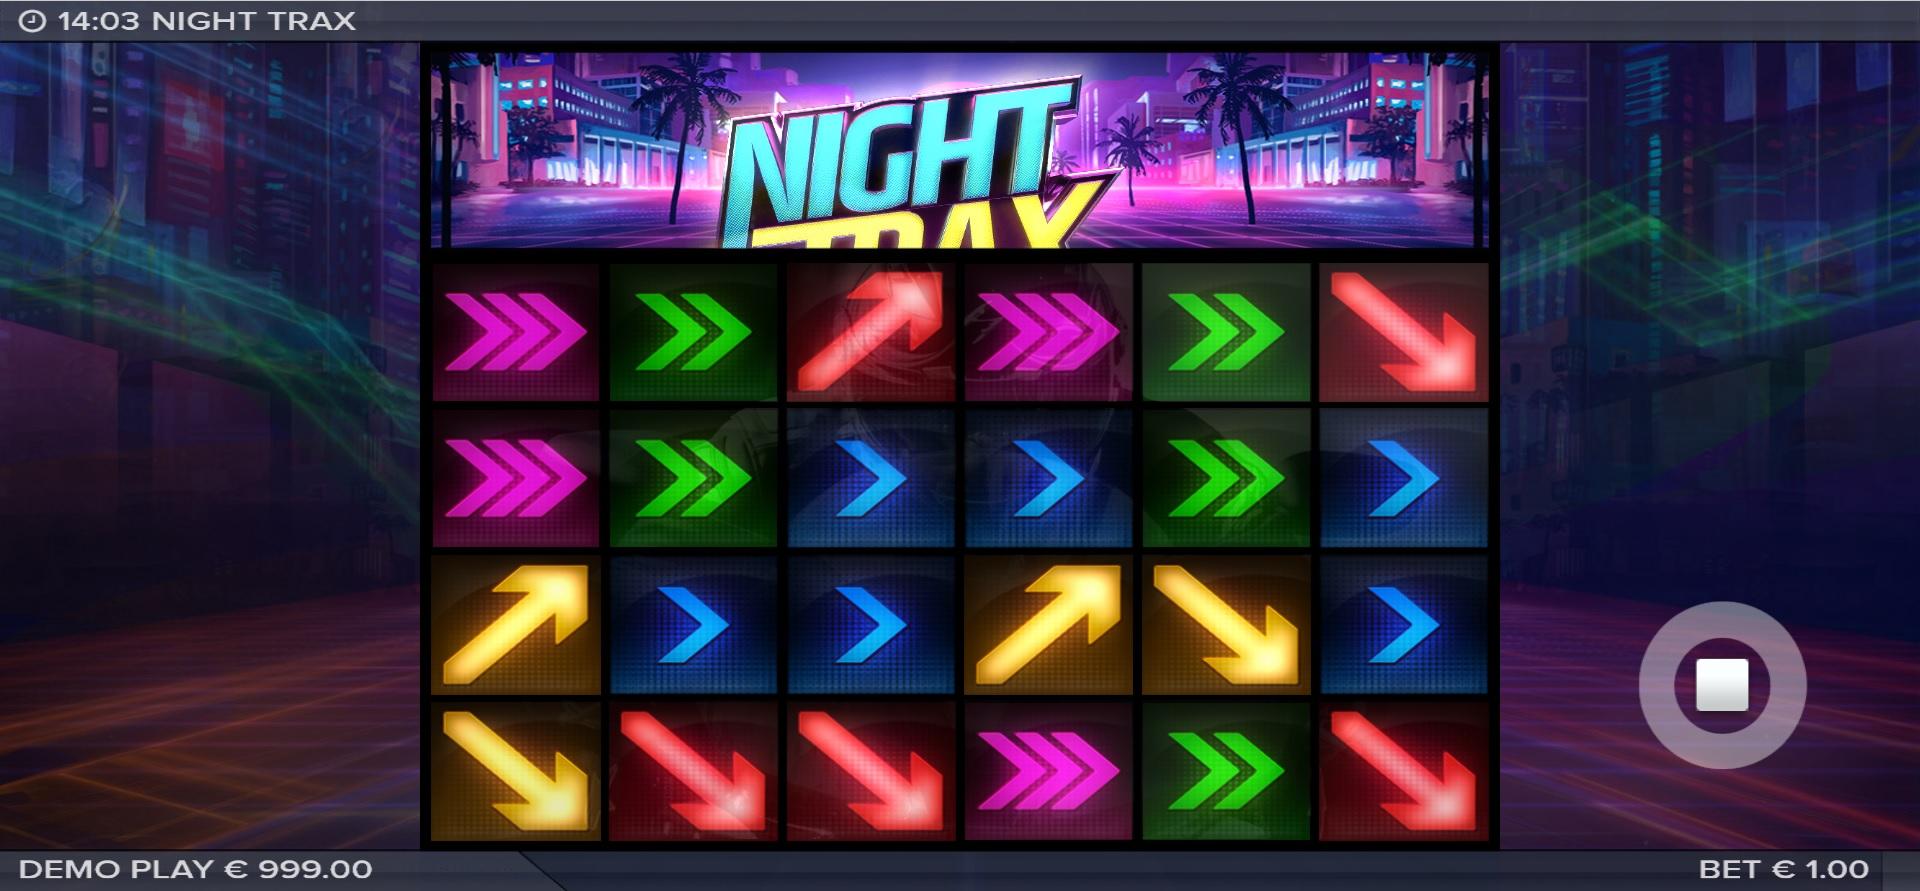 Night Trax by ELK Studios released on 06.07.2021